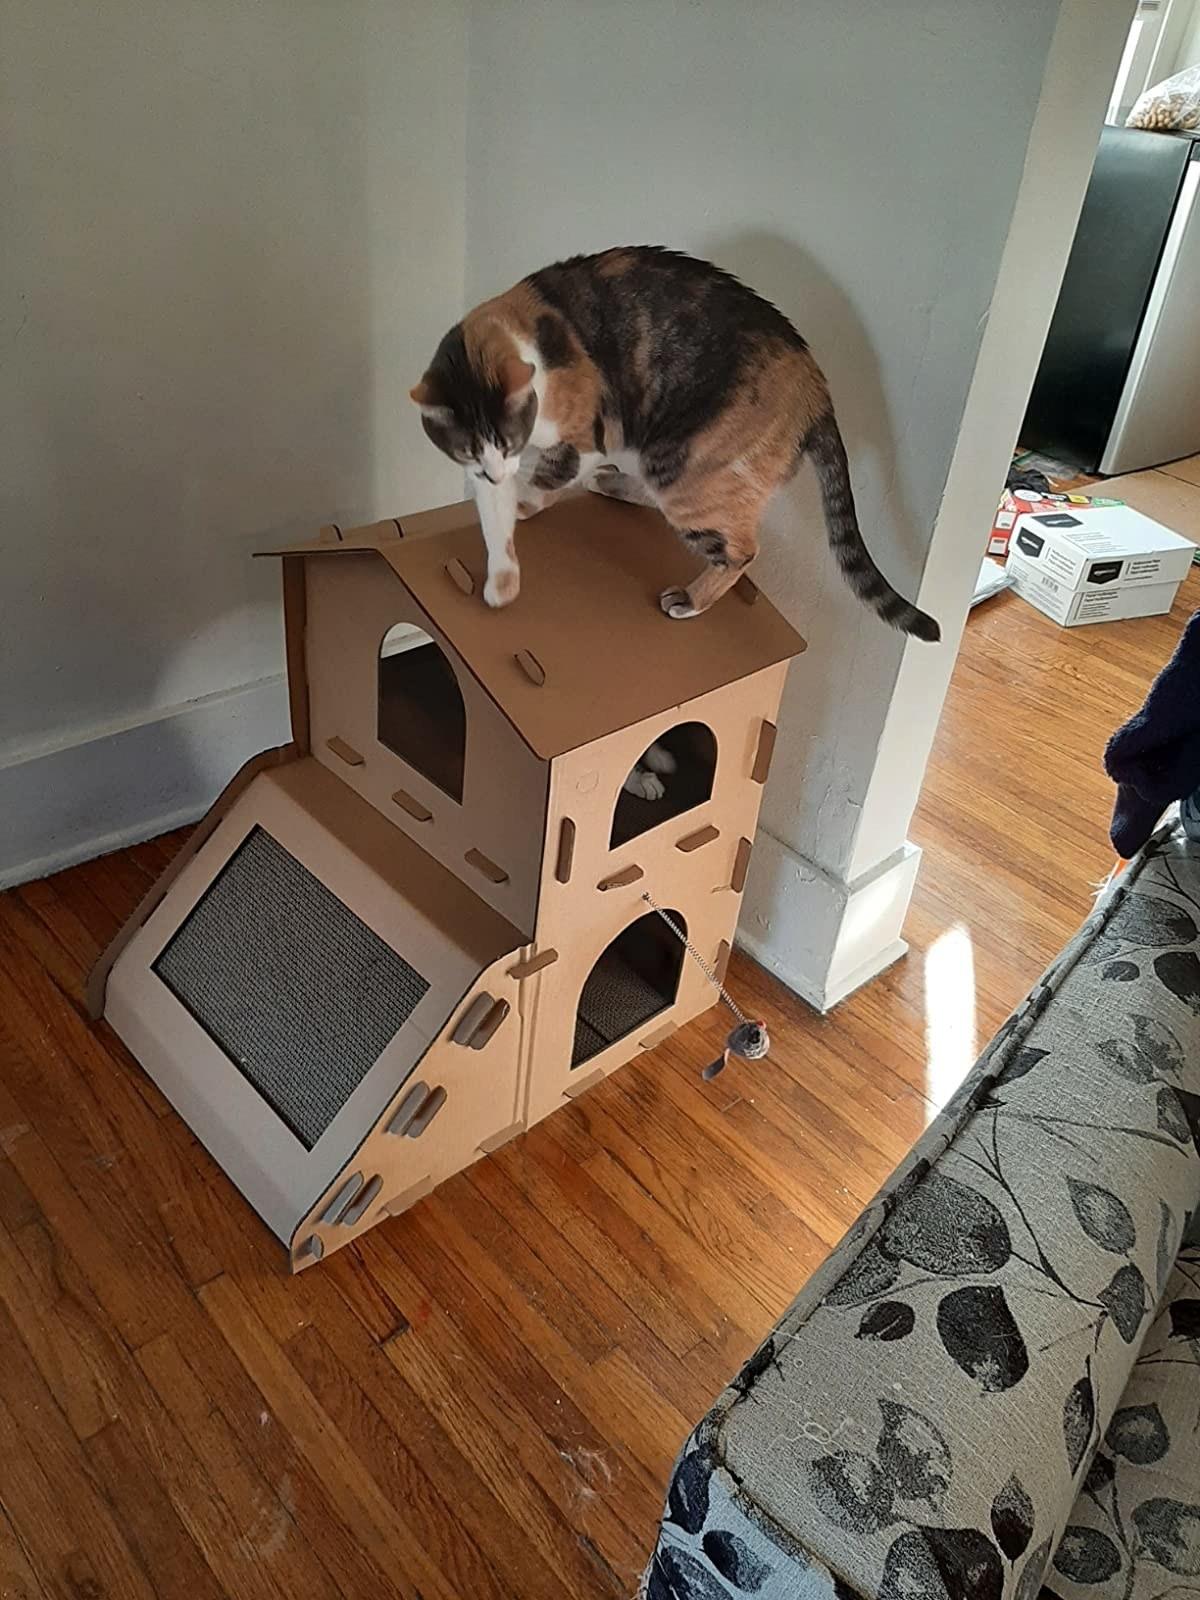 A calico cat on a multi-story cardboard scratcher